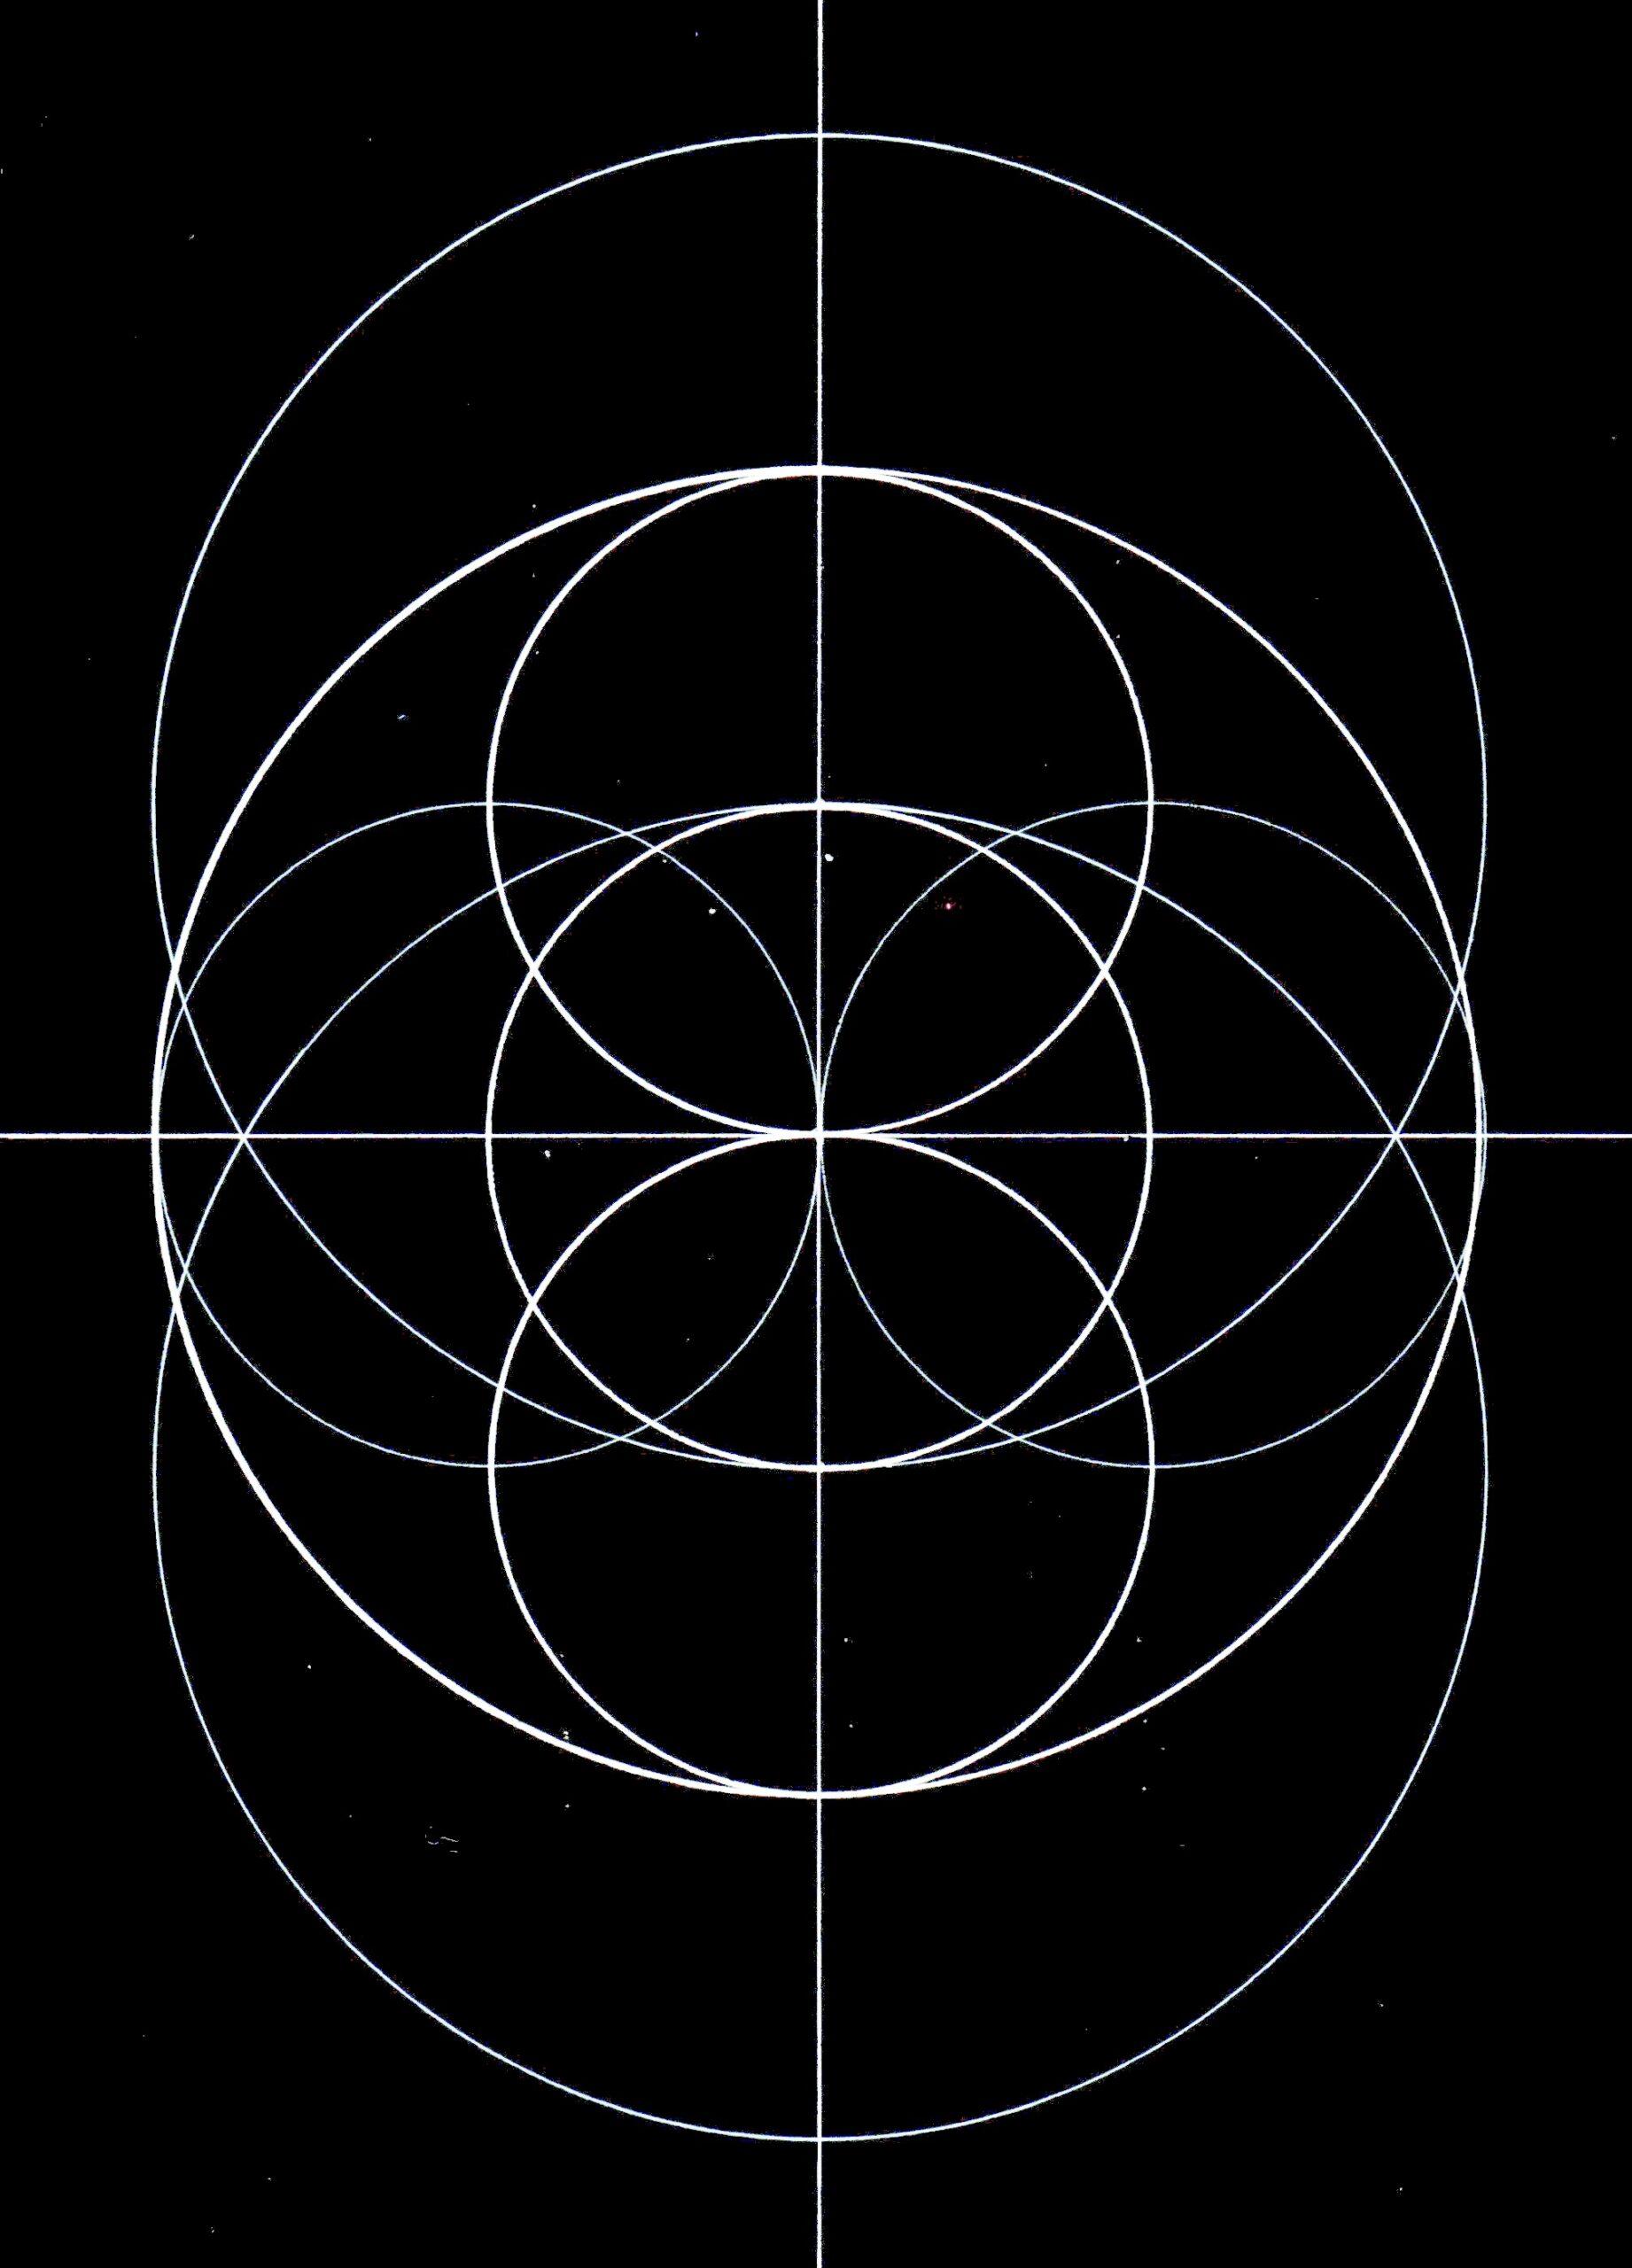 Three Circles in One by Katya Nosyreva